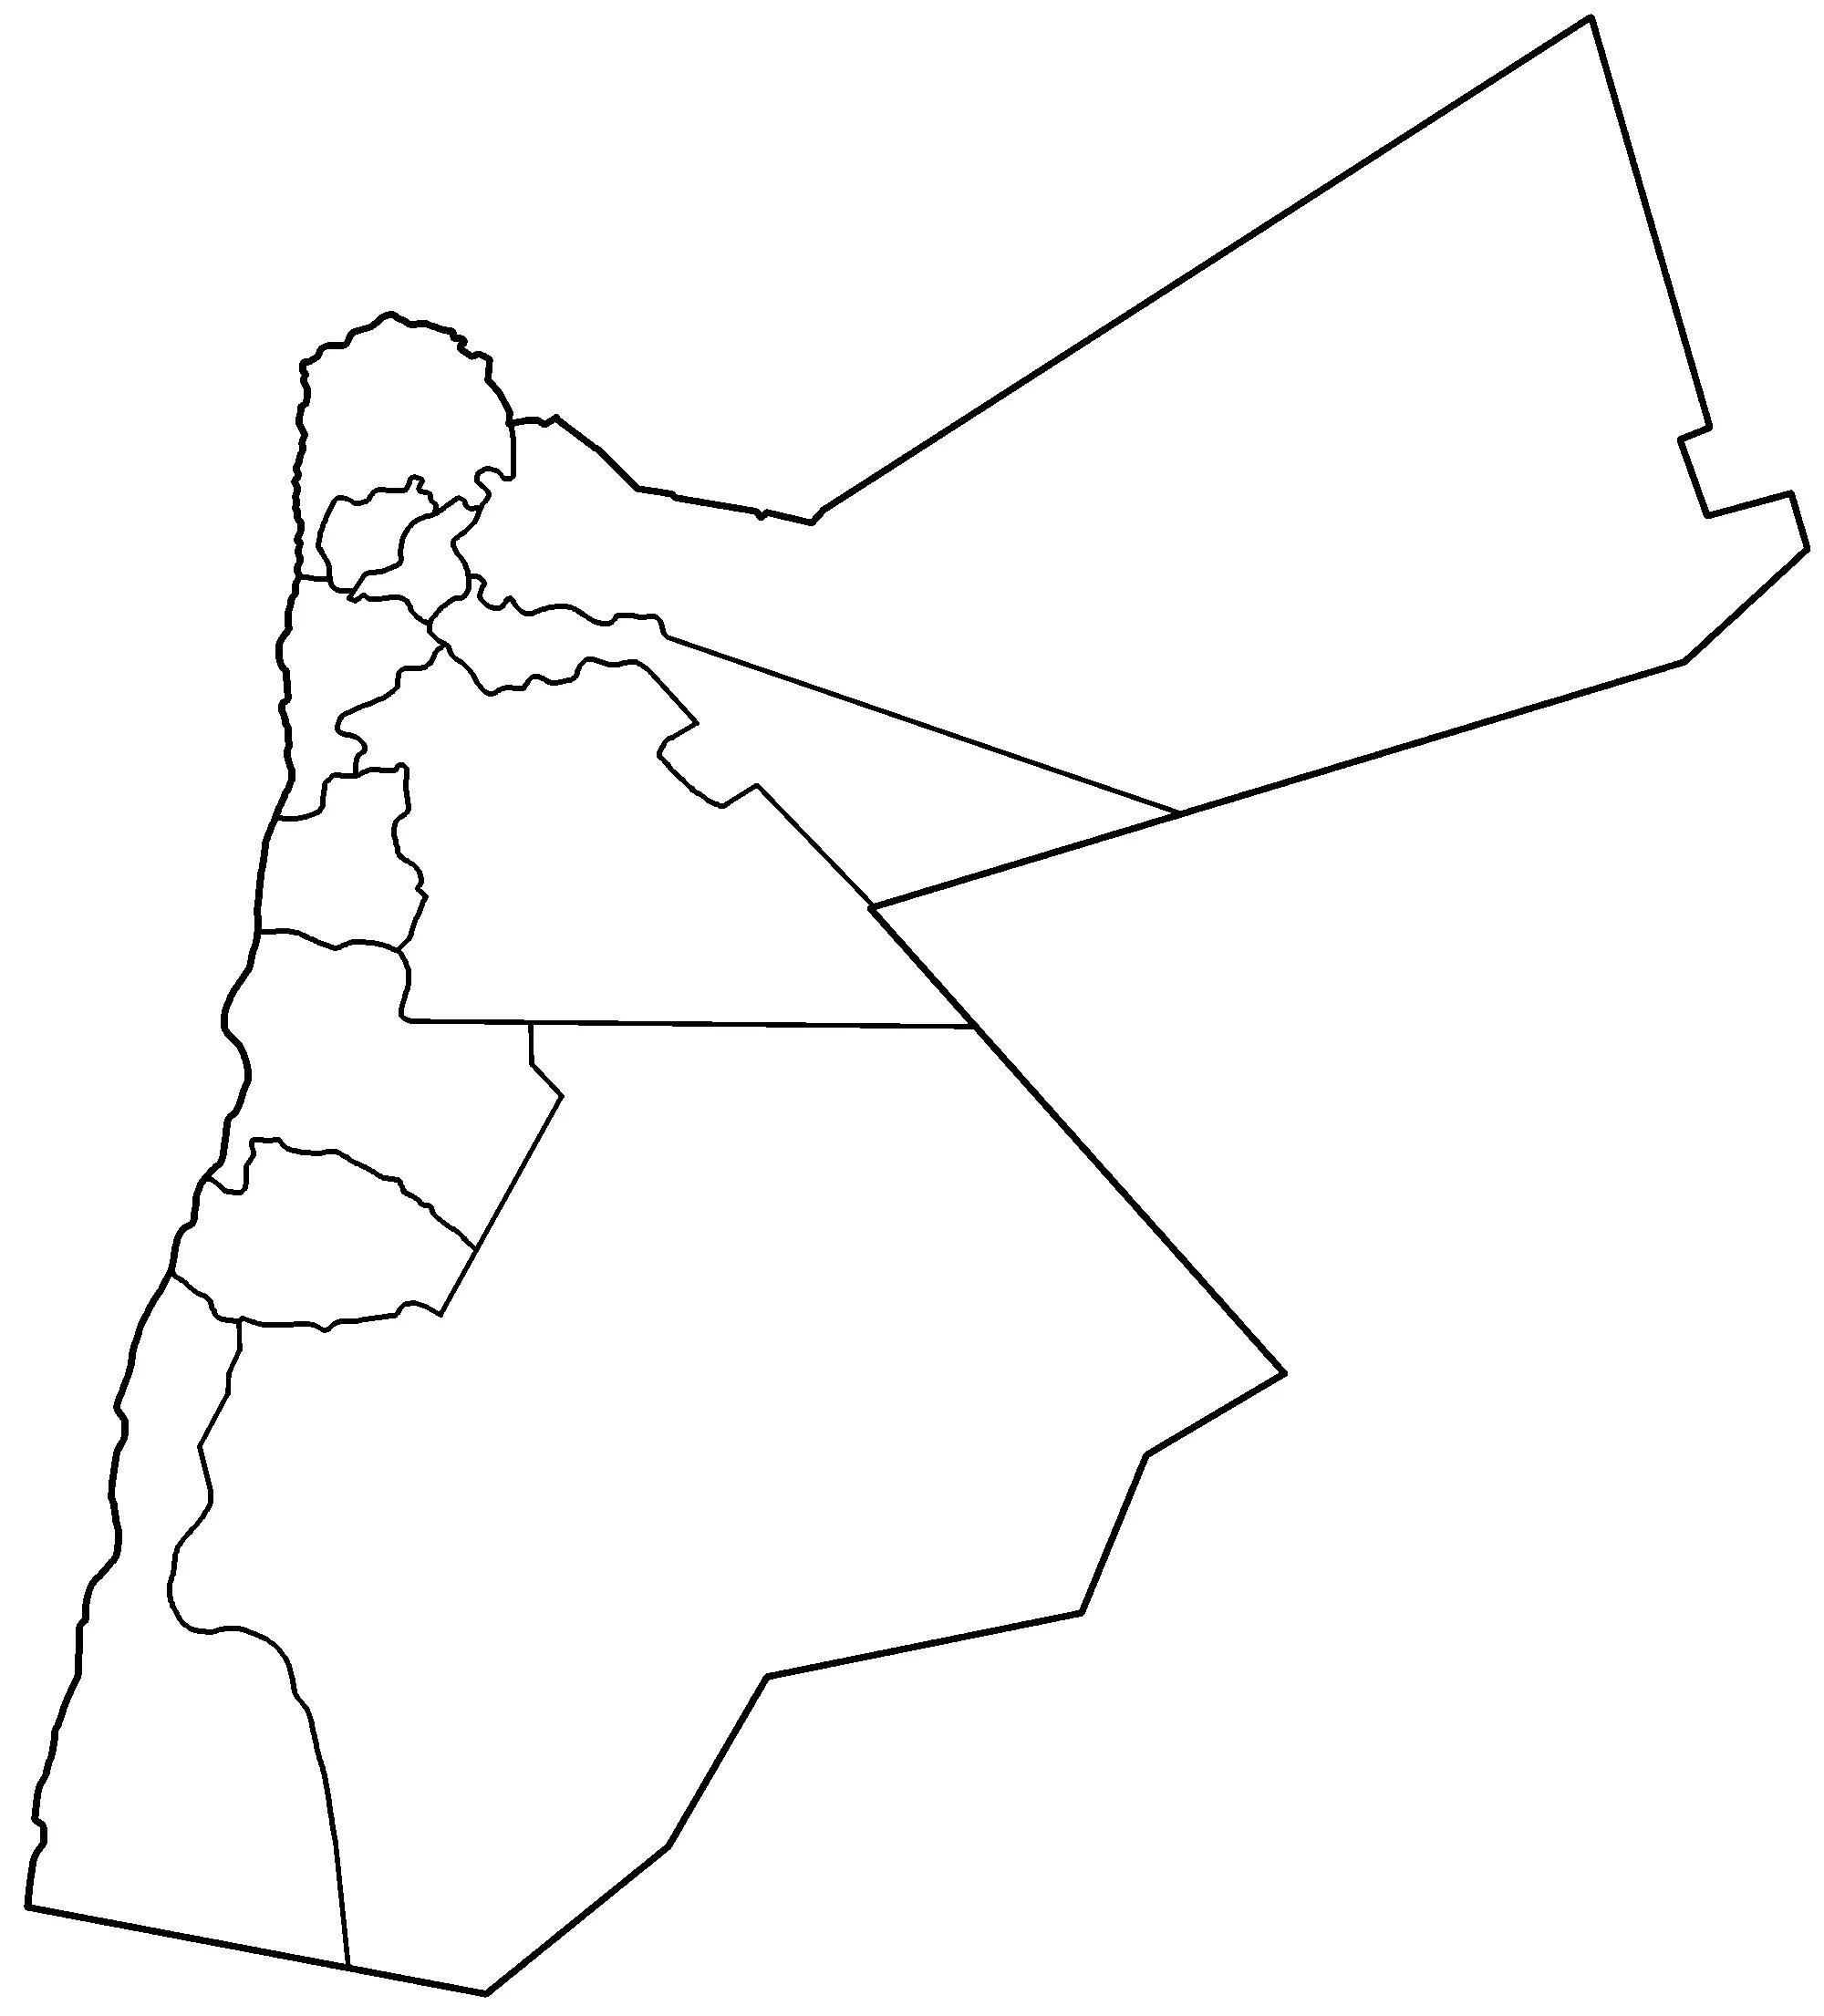 Jordan Governorates Blank Mapsof